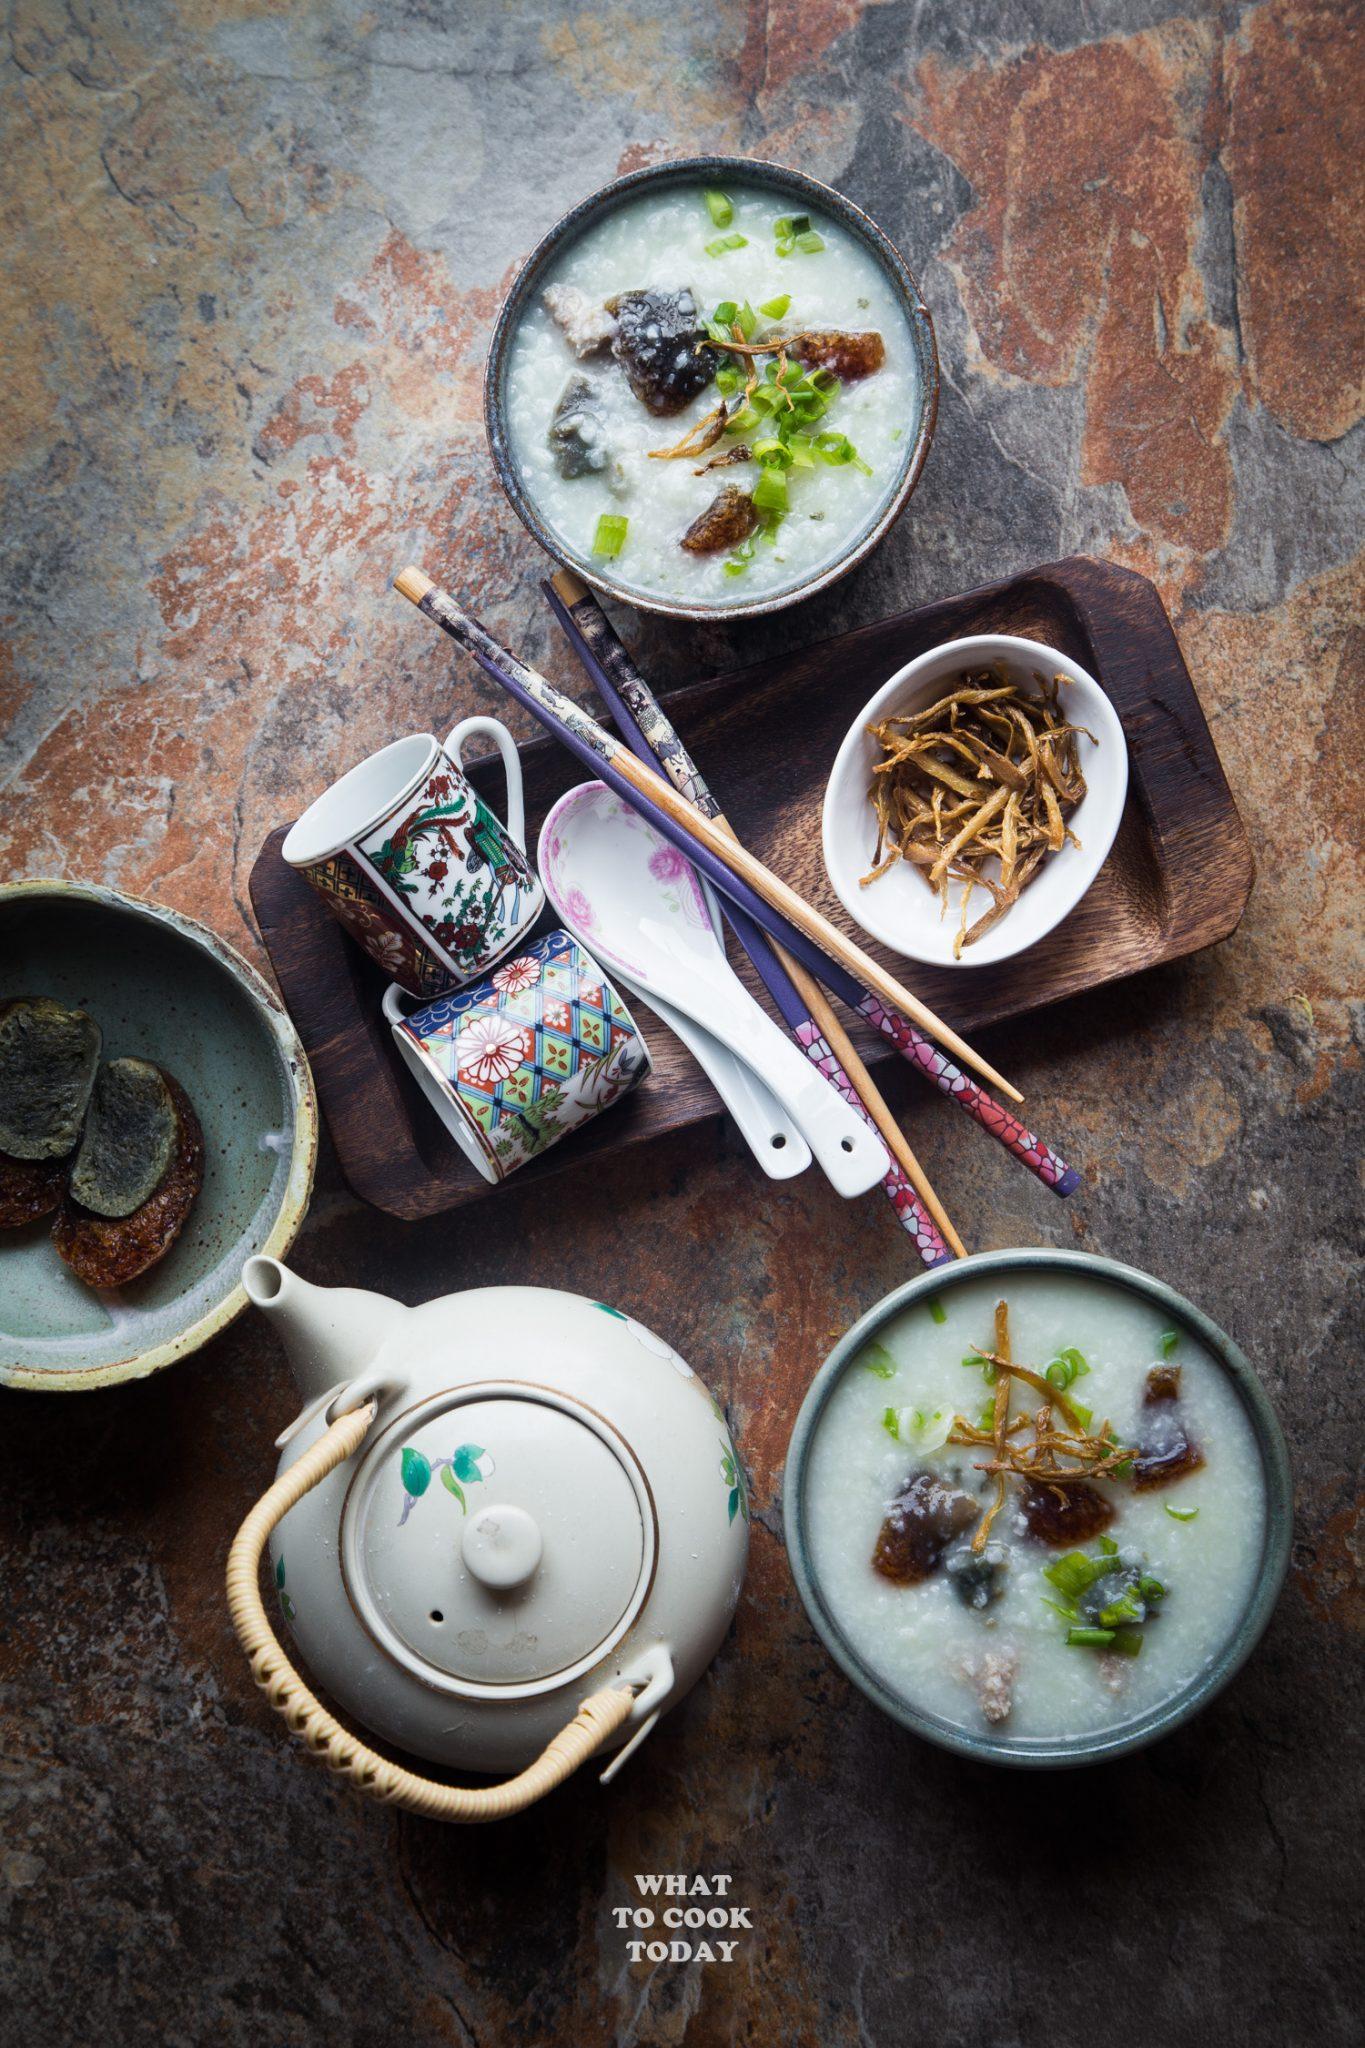 Pork and century egg congee (Bubur pitan) flatlay